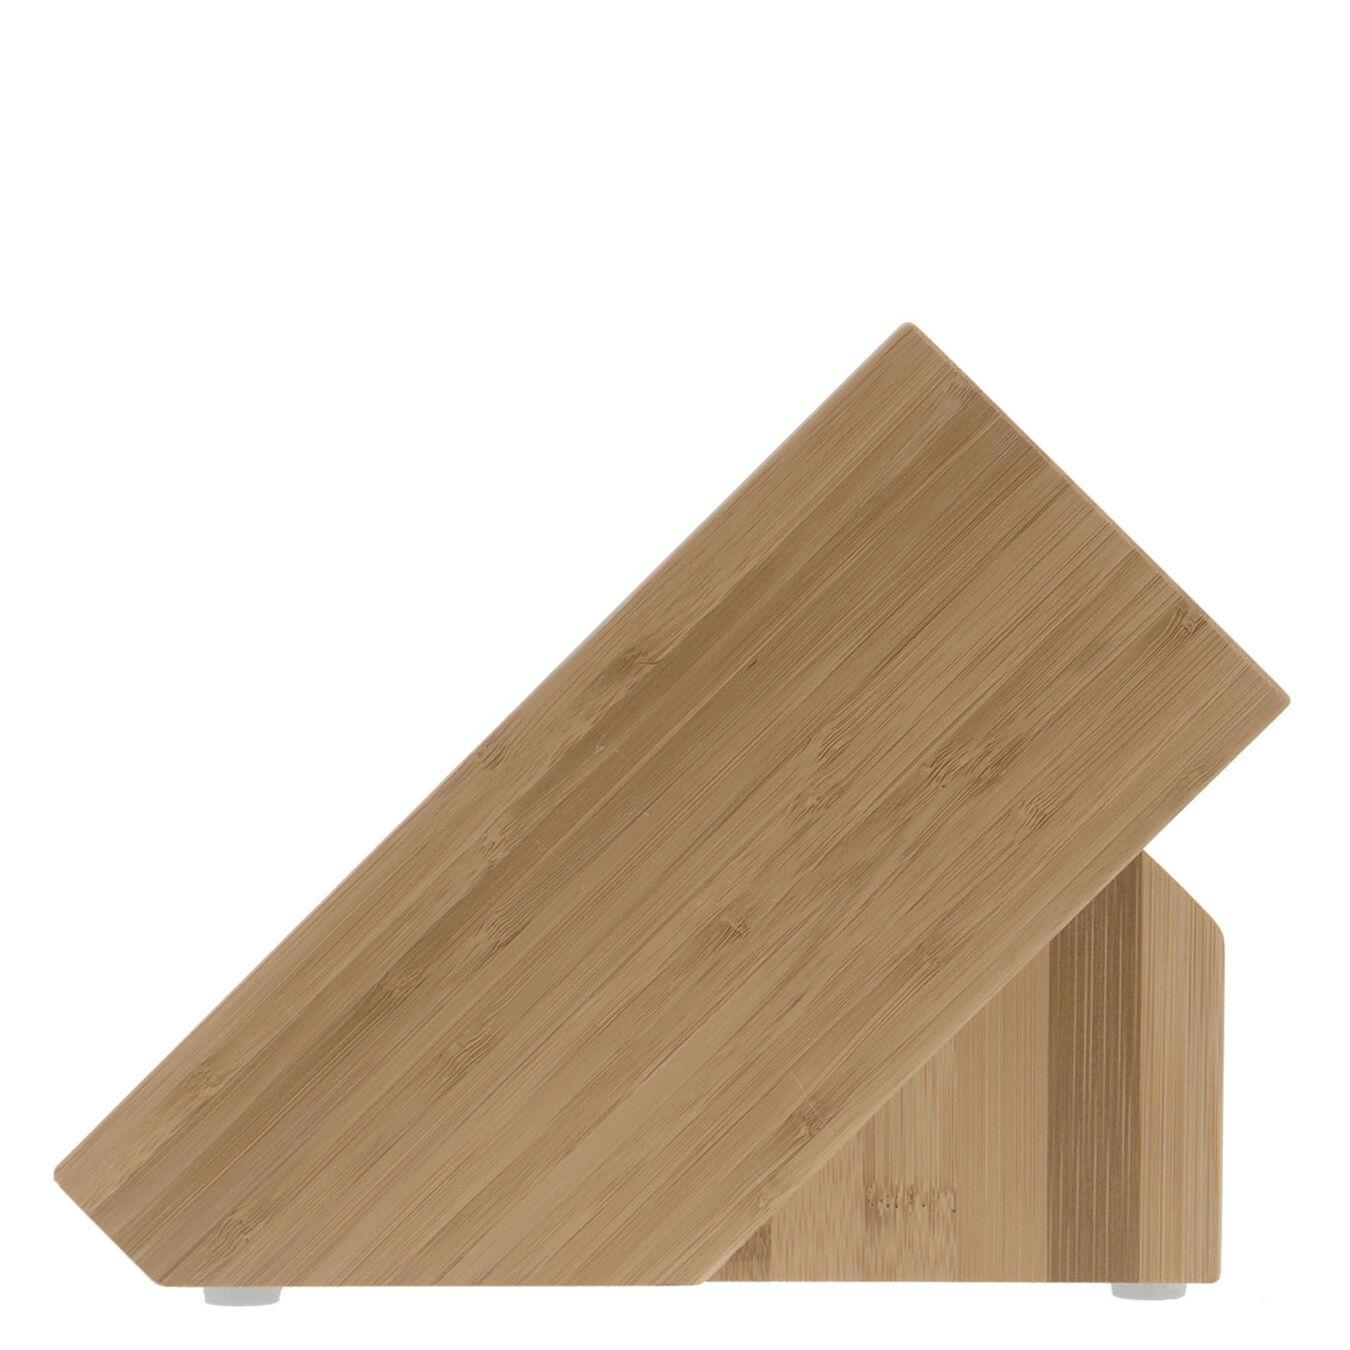 bamboo, TWIN Knife block empty,,large 5